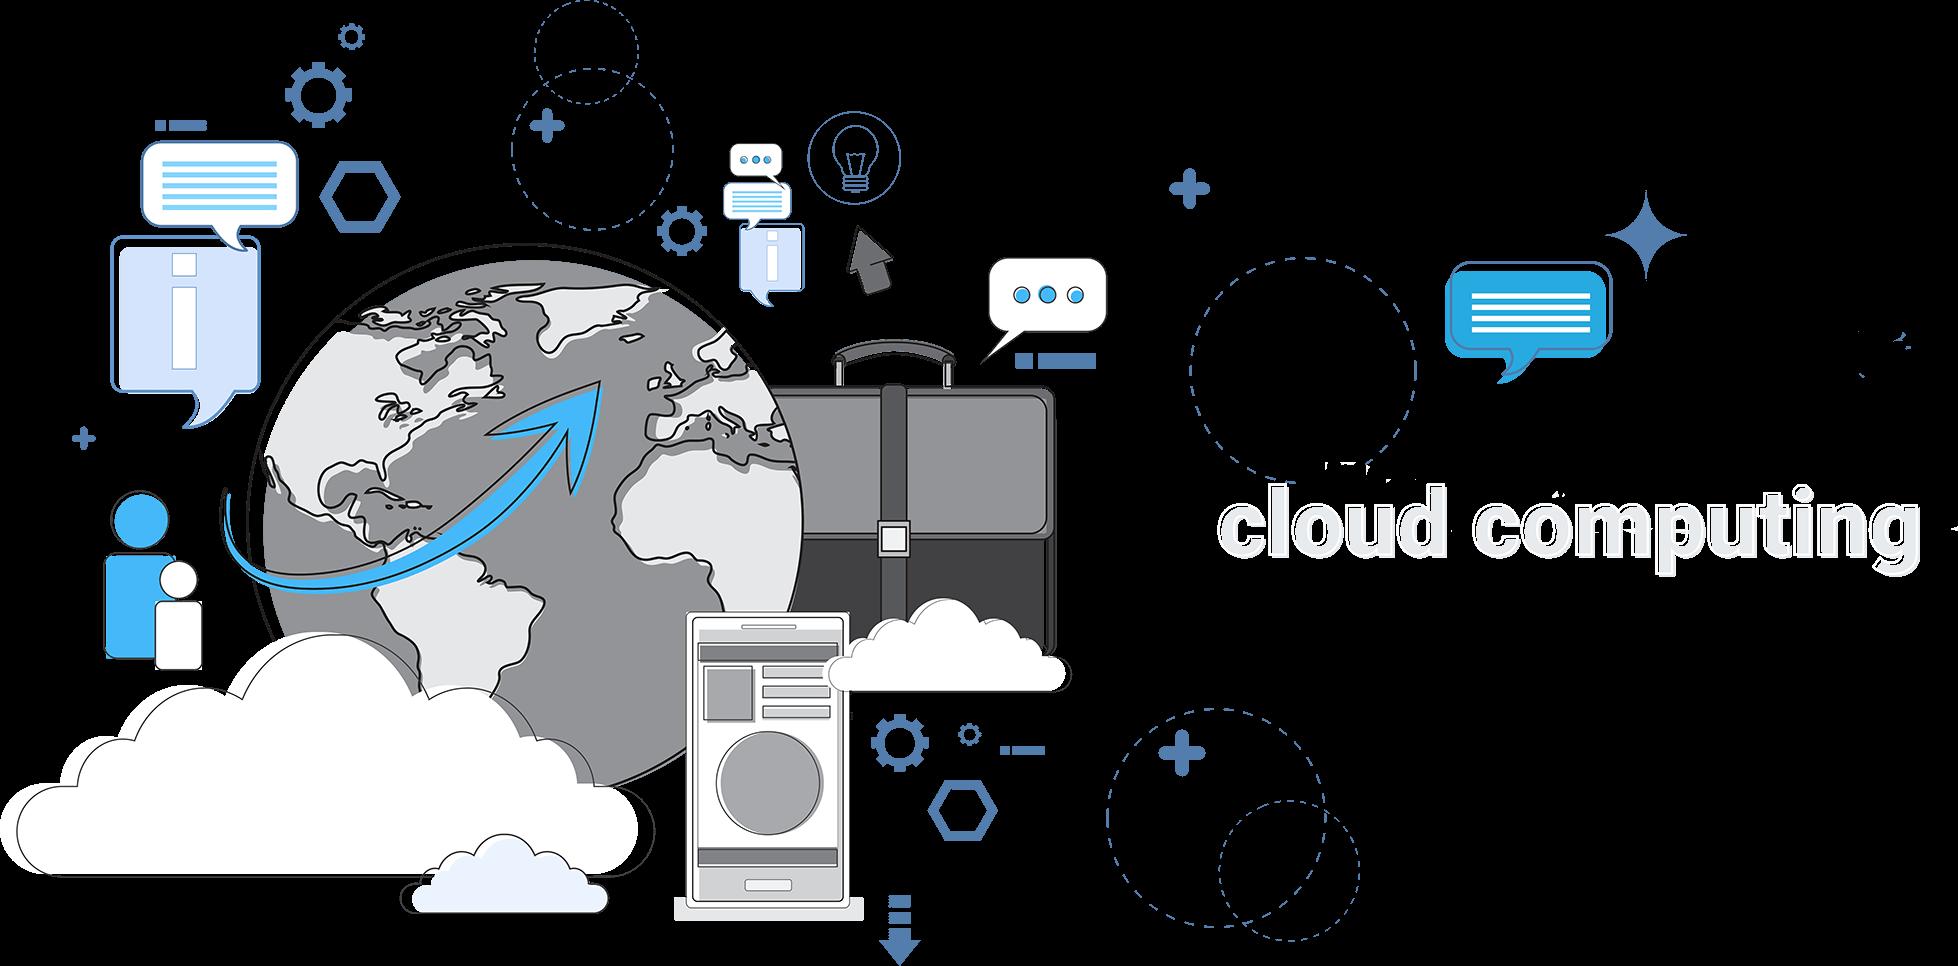 grovetechDRIVE cloud computing